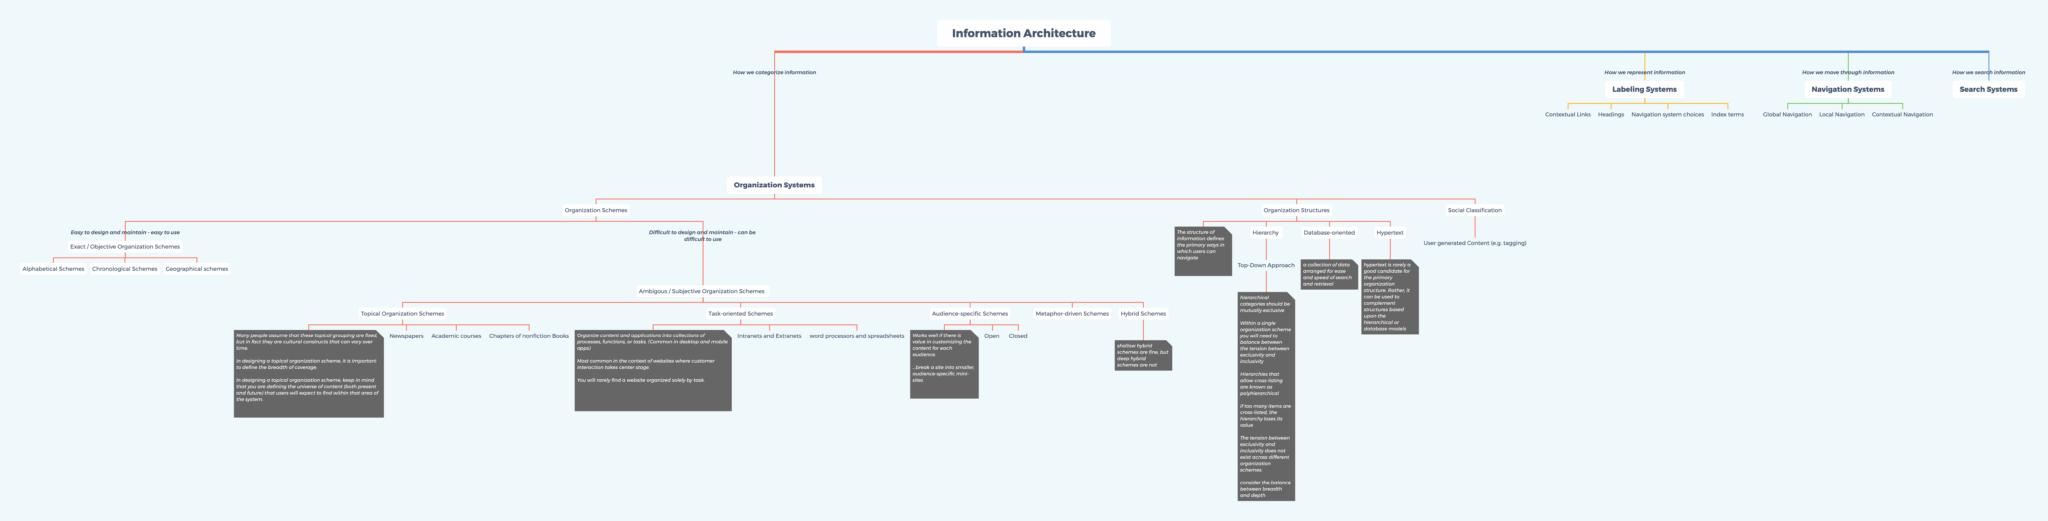 Information-Architecture-2048x521